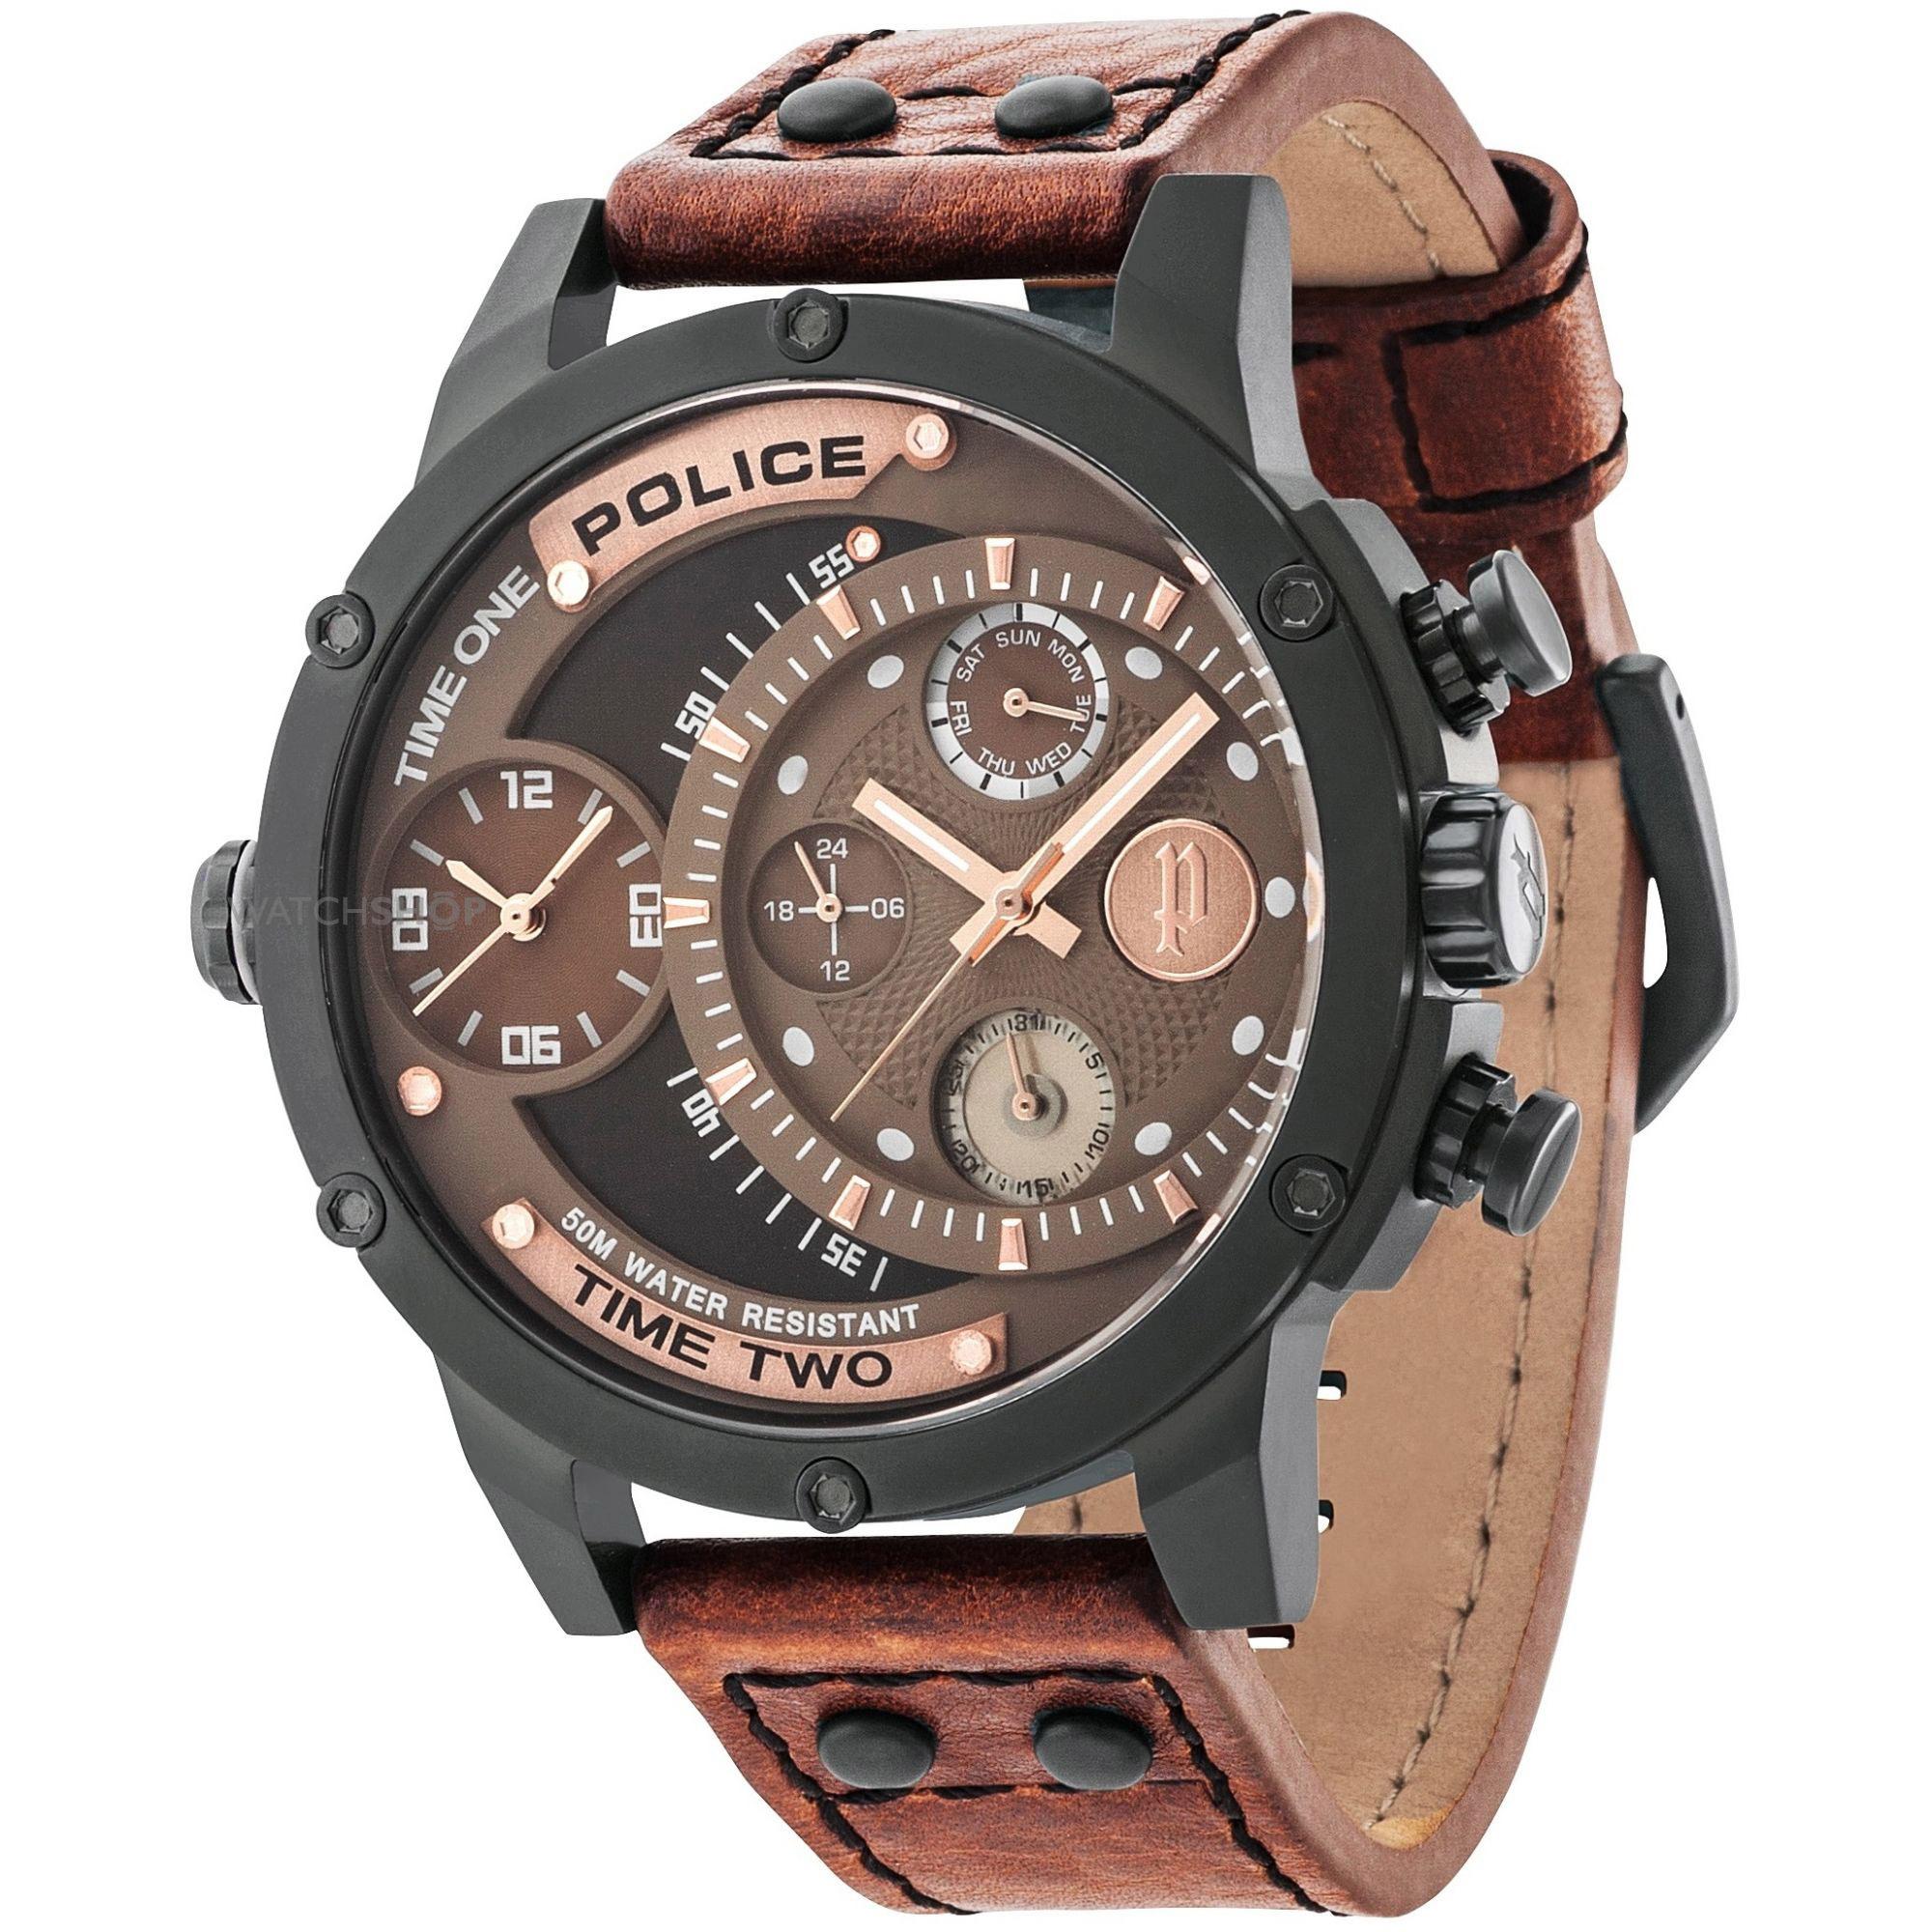 POLICE(ポリス)腕時計 ADDERアダー ブラウン/カッパー【14536JSB-12A】